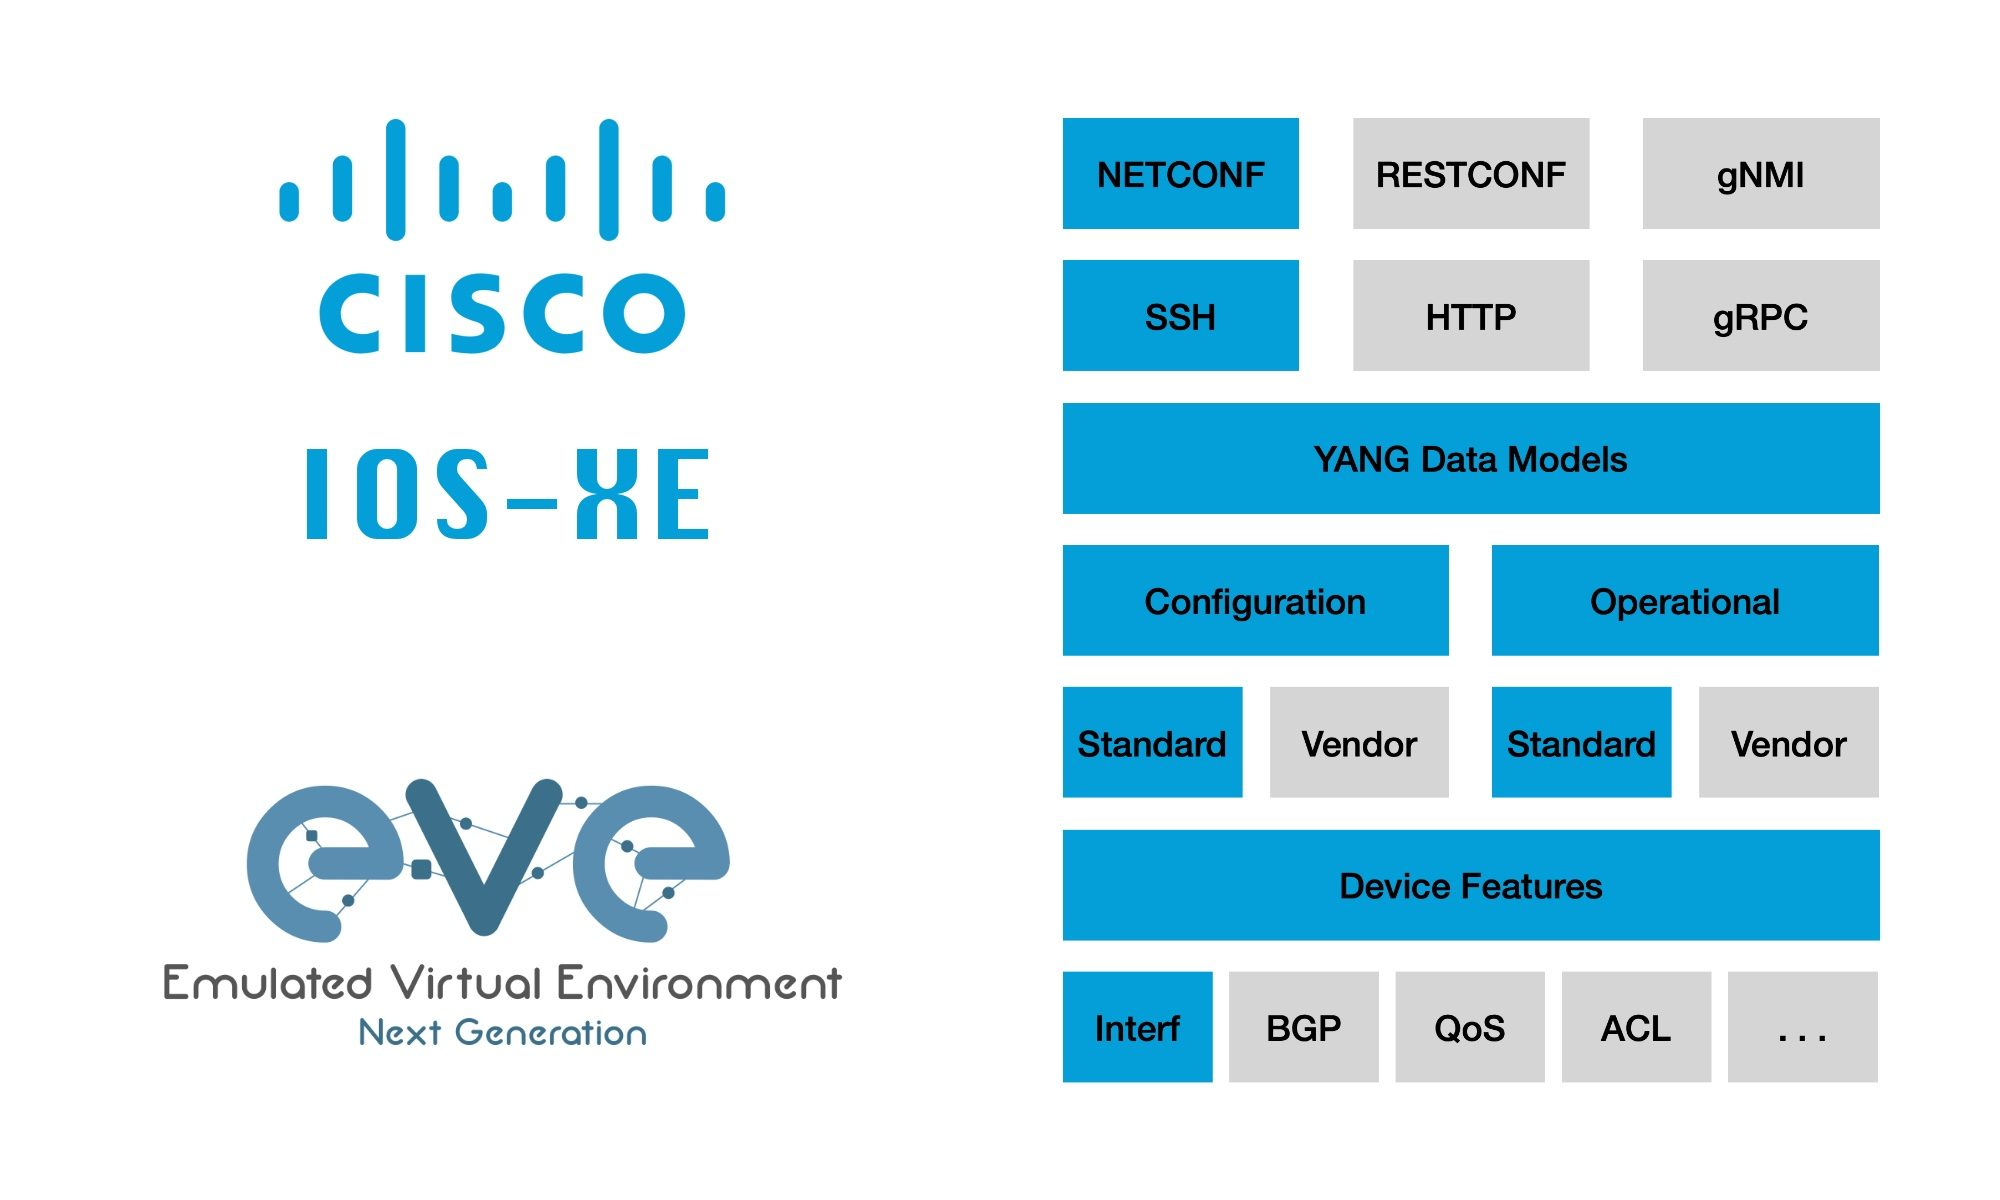 Cisco IOS-XE NETCONF YANG